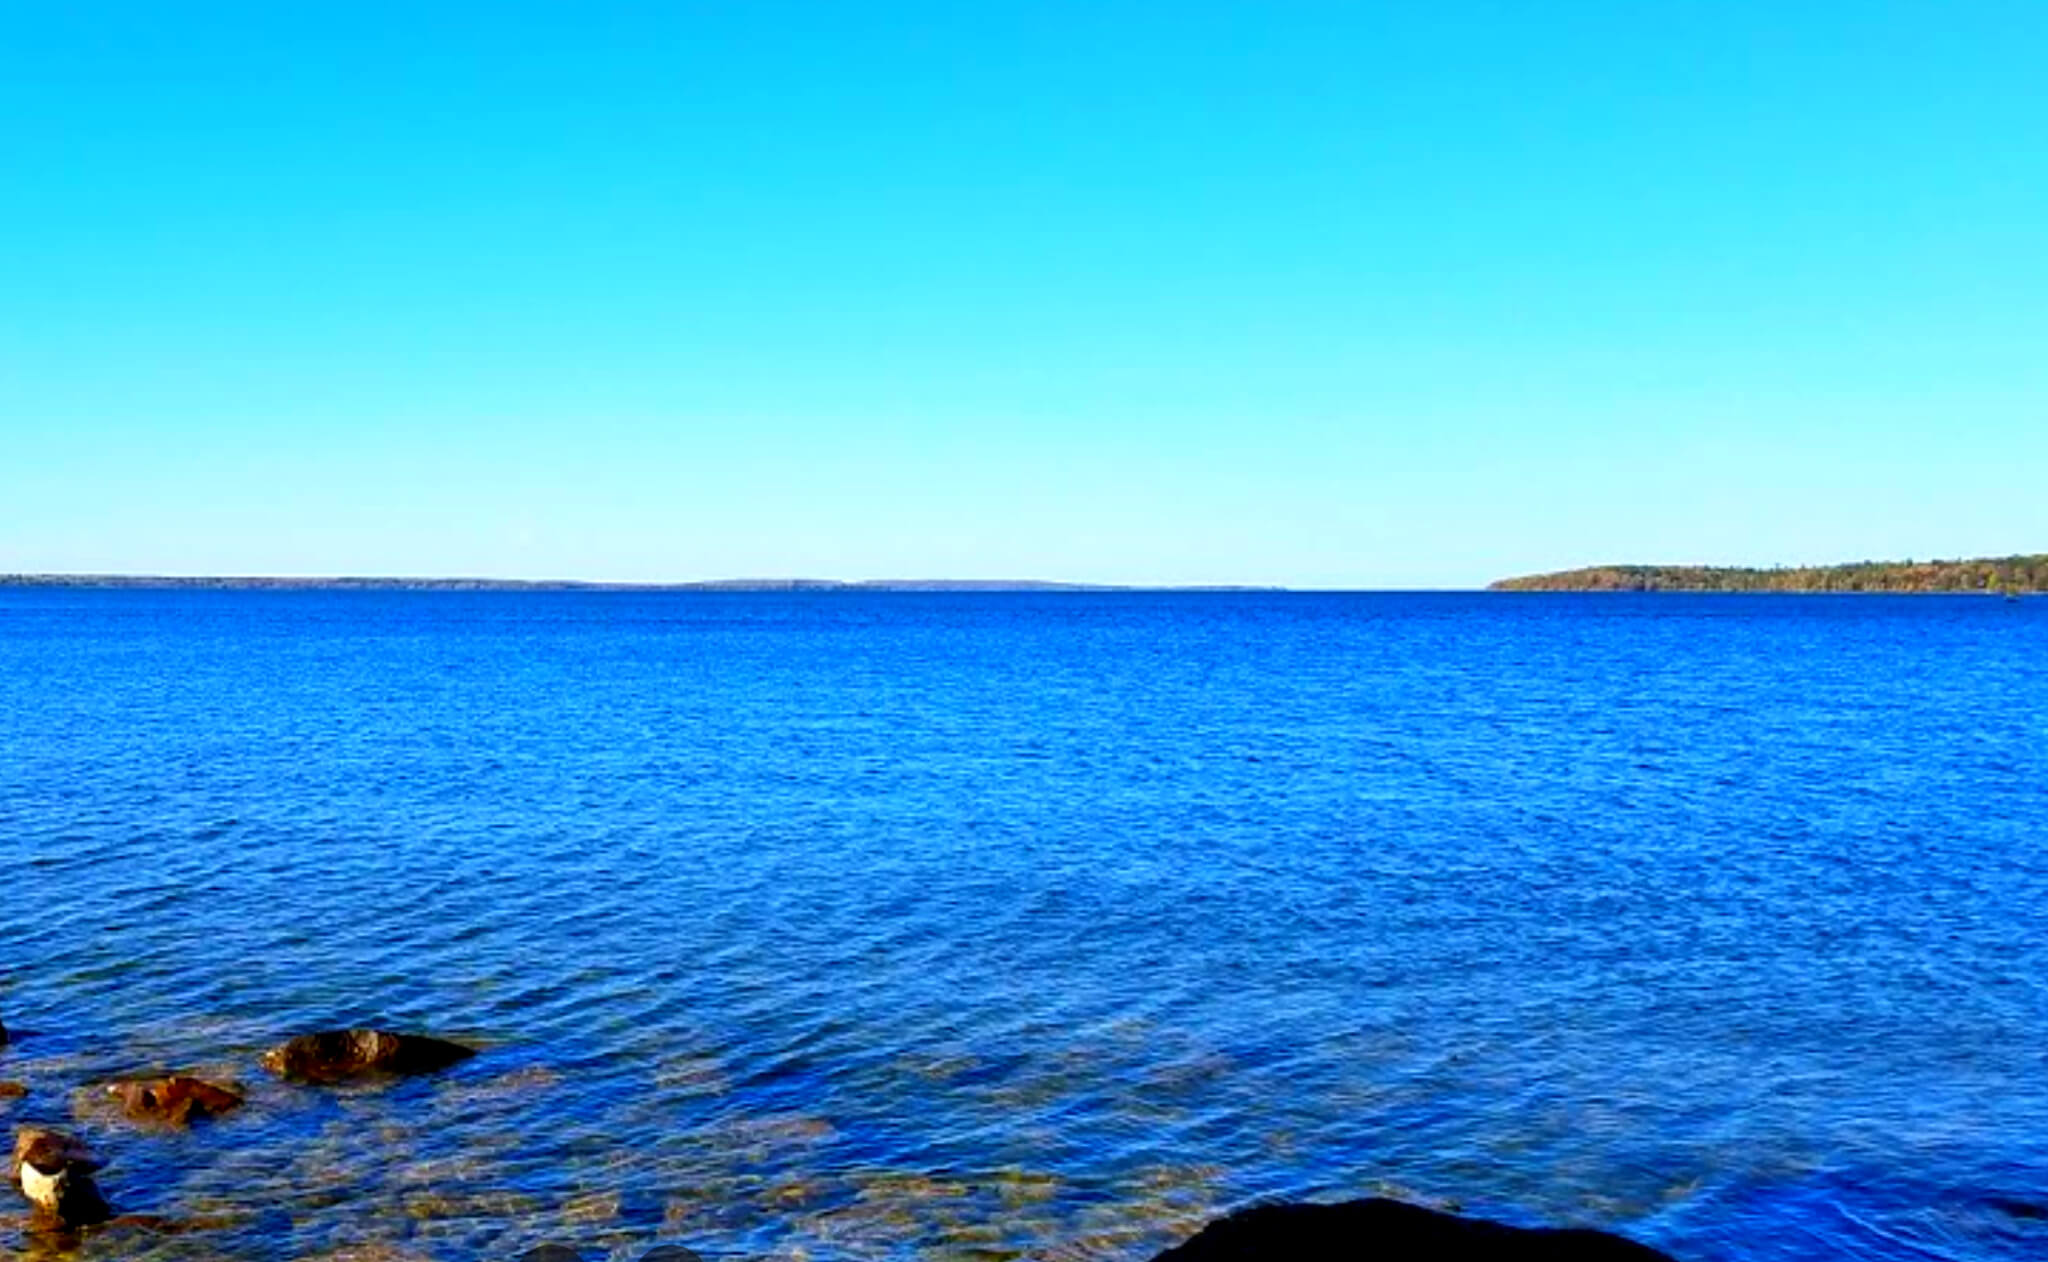 Leech-Lake-Fishing-Report-Guide-Minnesota-MN-02-1